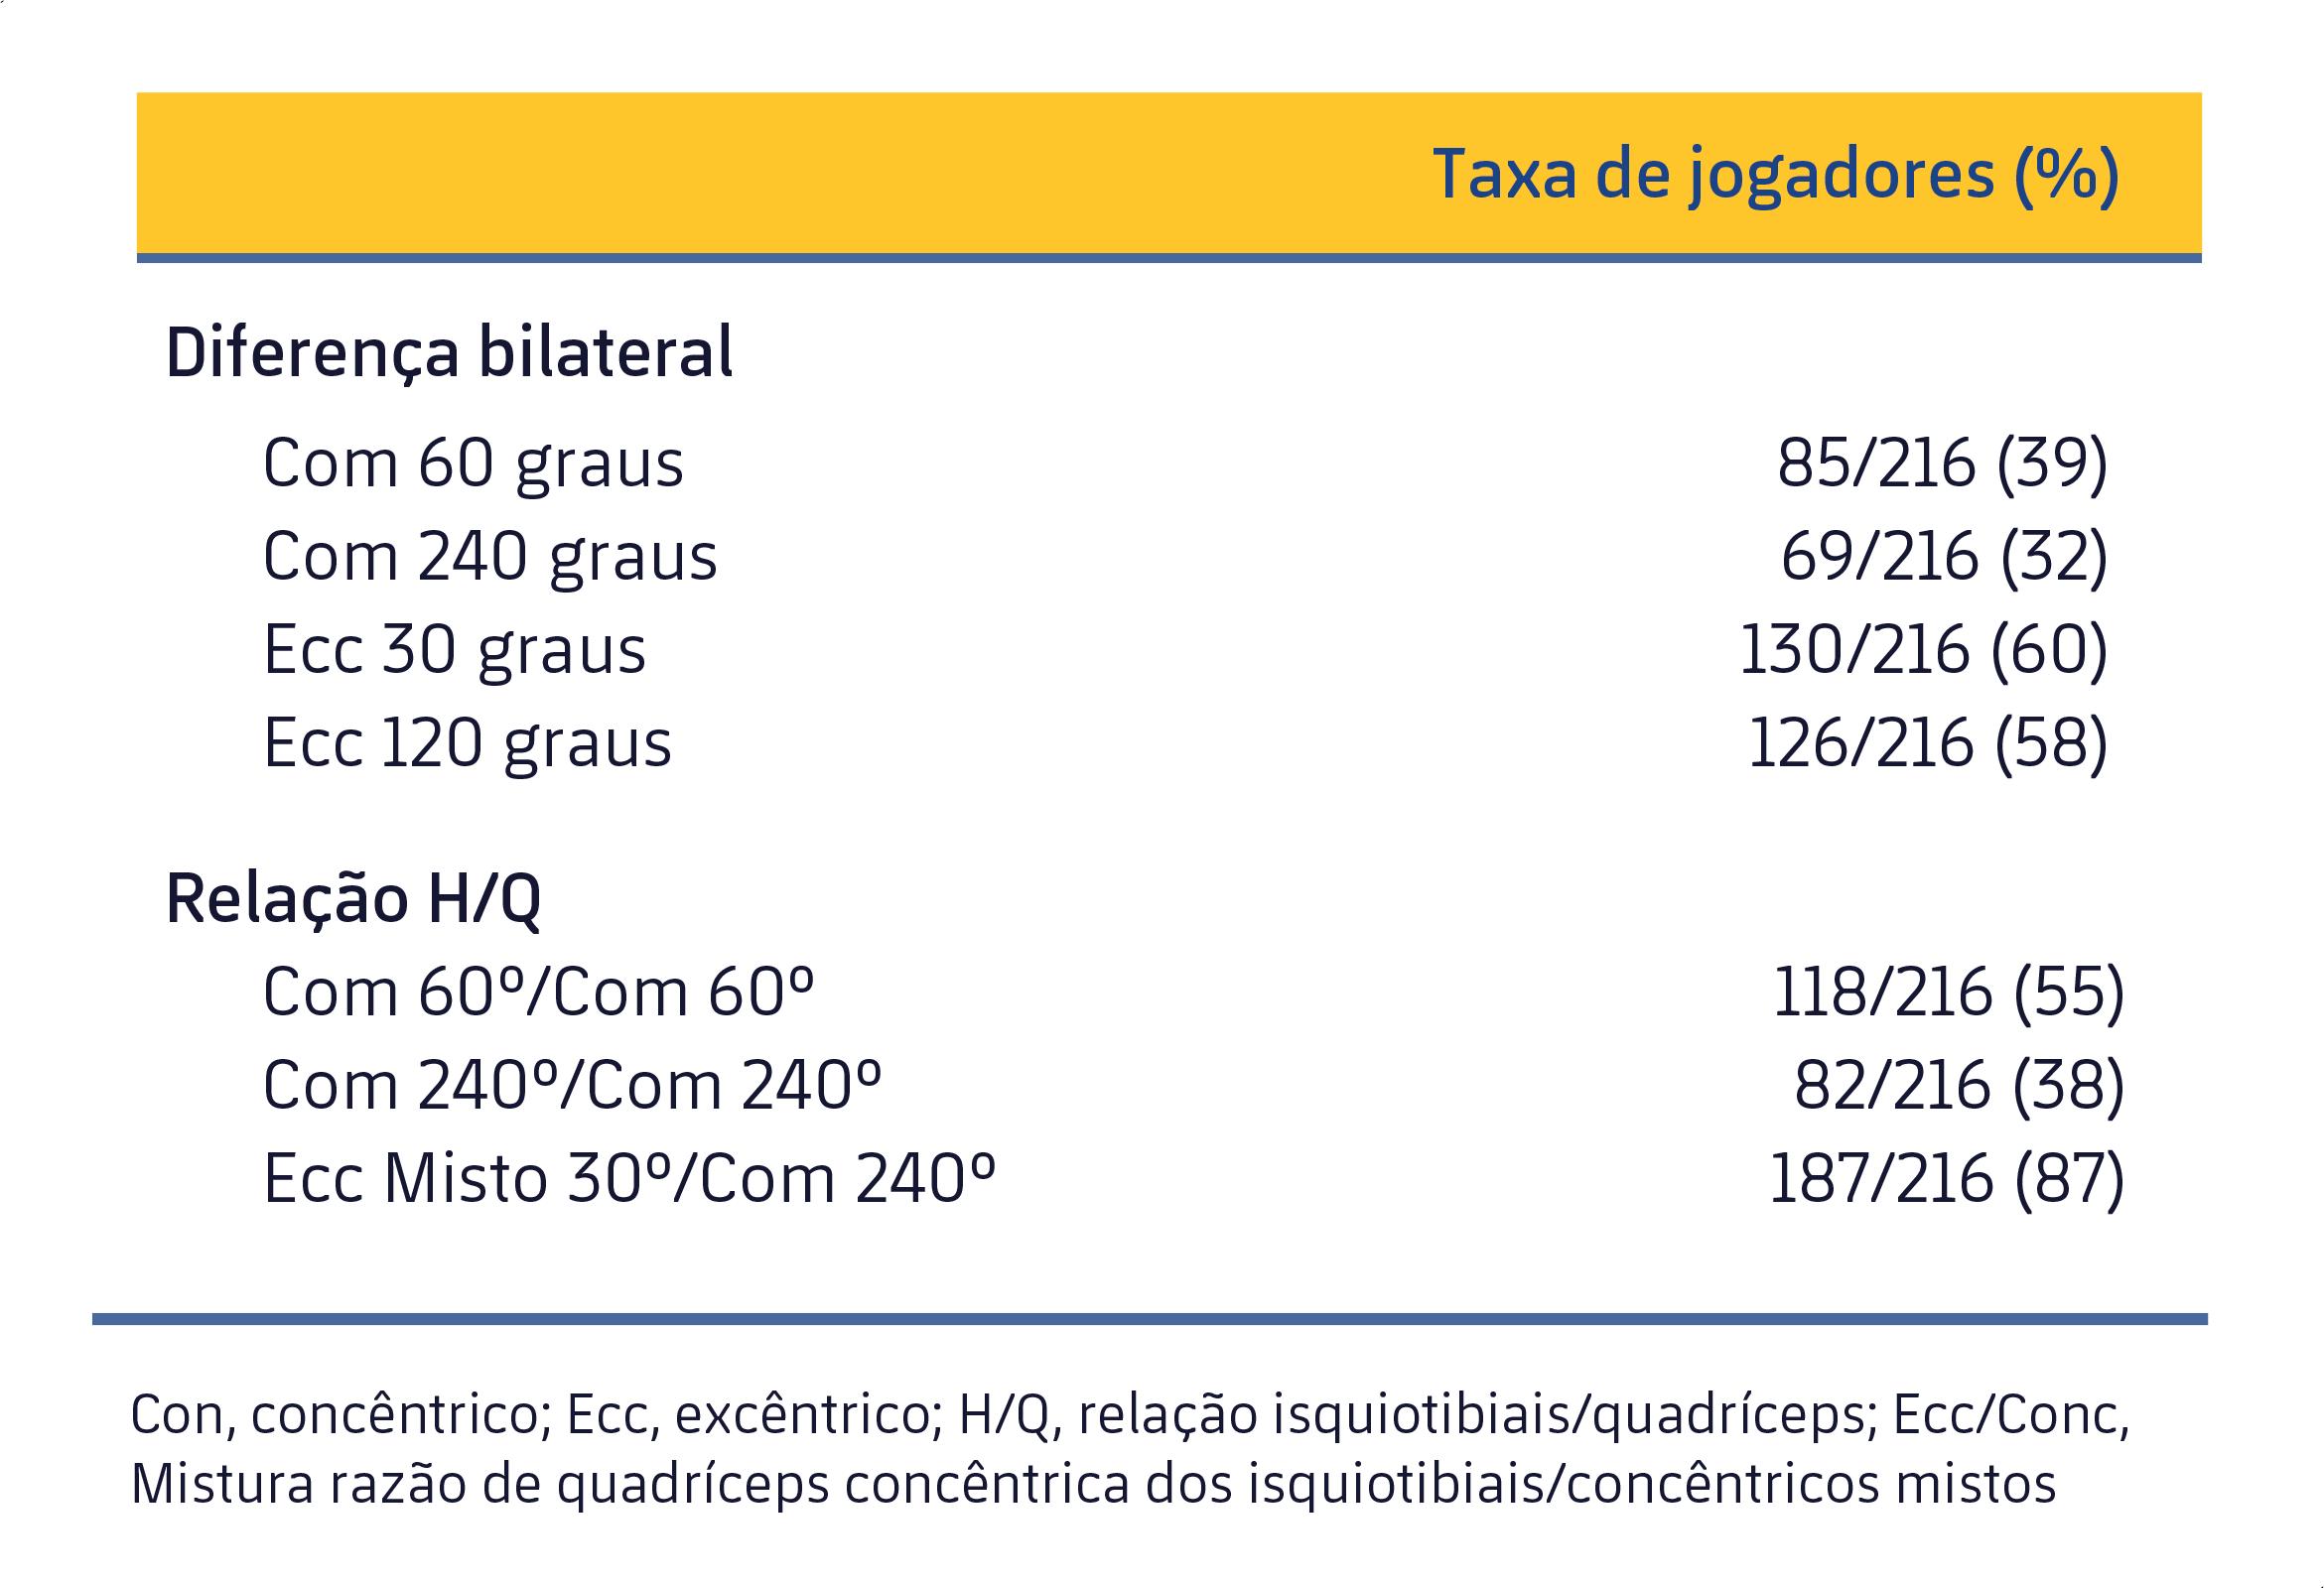 Tabela 1. Lista de jogadores que apresentaram desequilíbrios nos grupos musculares das pernas (Croisier et al., 2008).